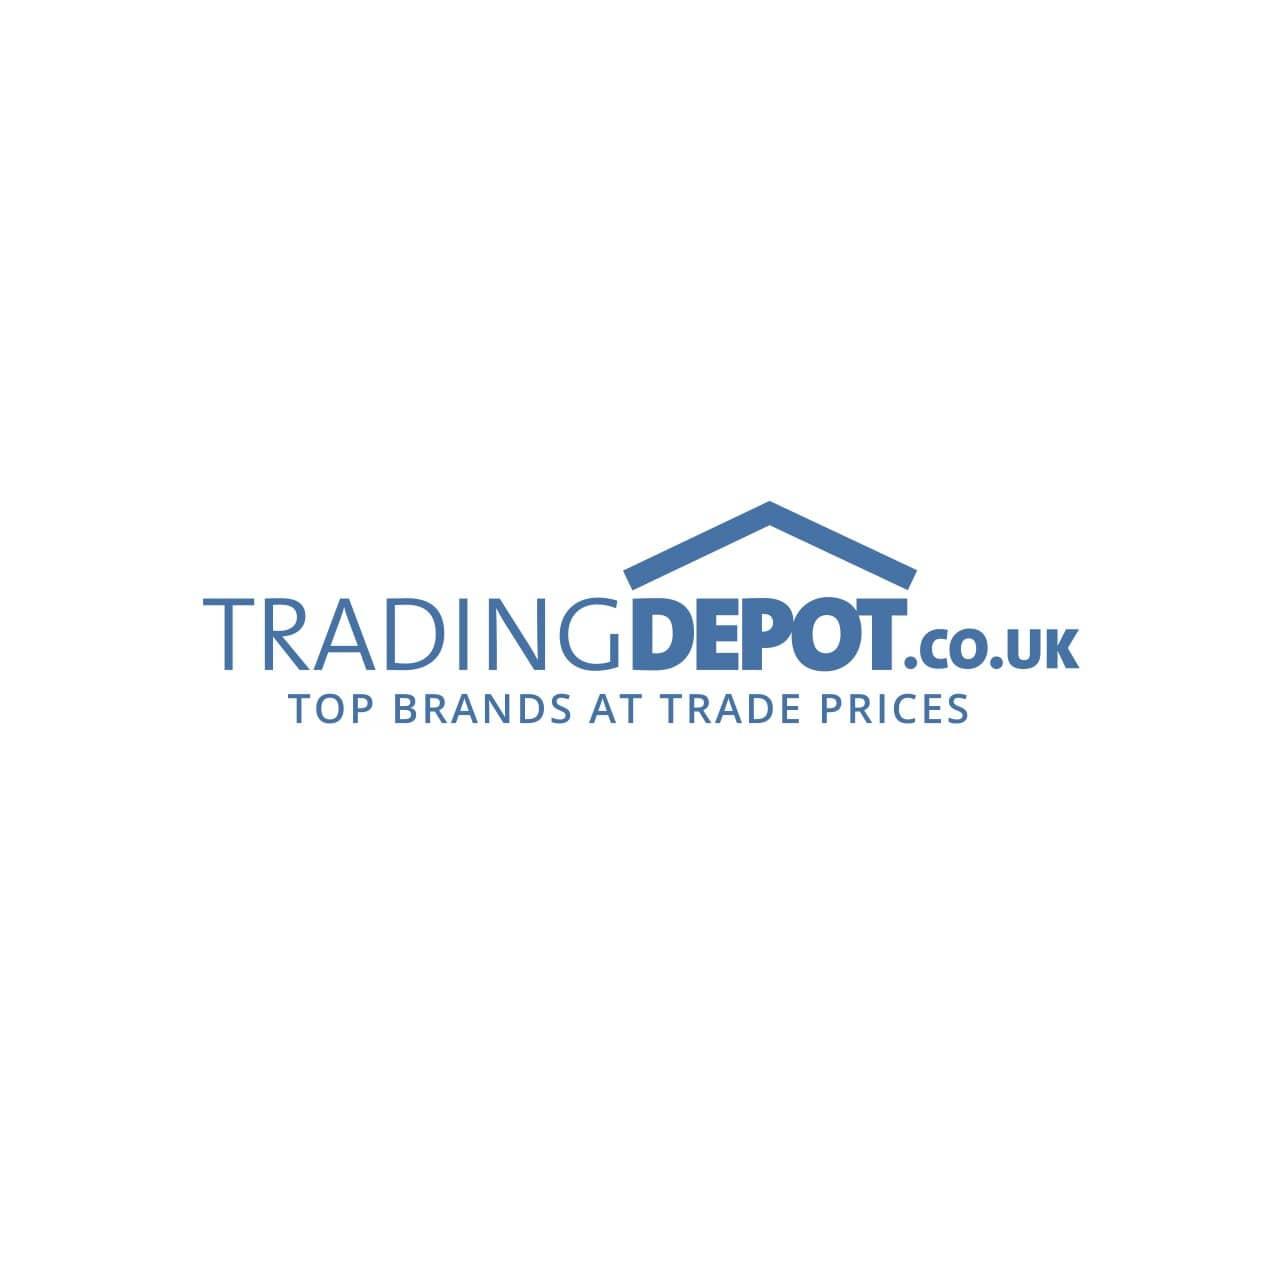 April Waifer Gloss White Tray 1700x800 - 5705/000